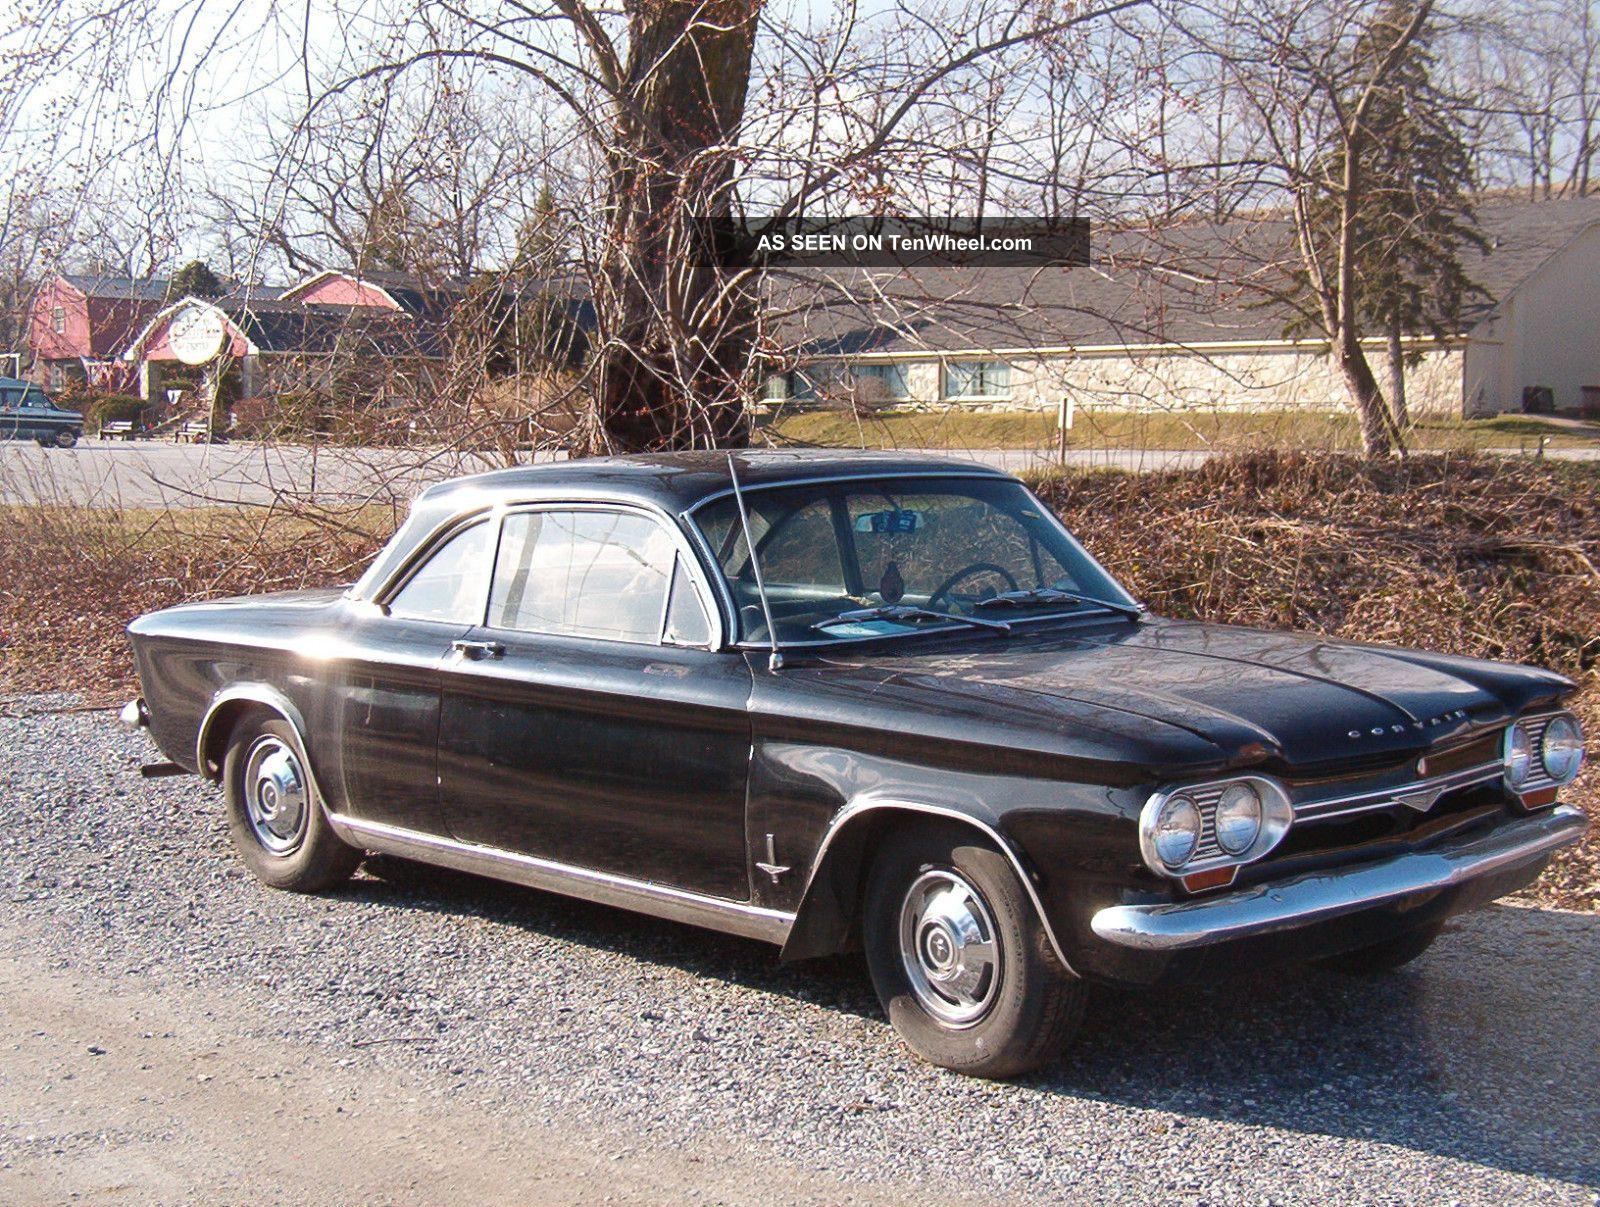 1964 Chevrolet Corvair Monza Coupe Corvair photo